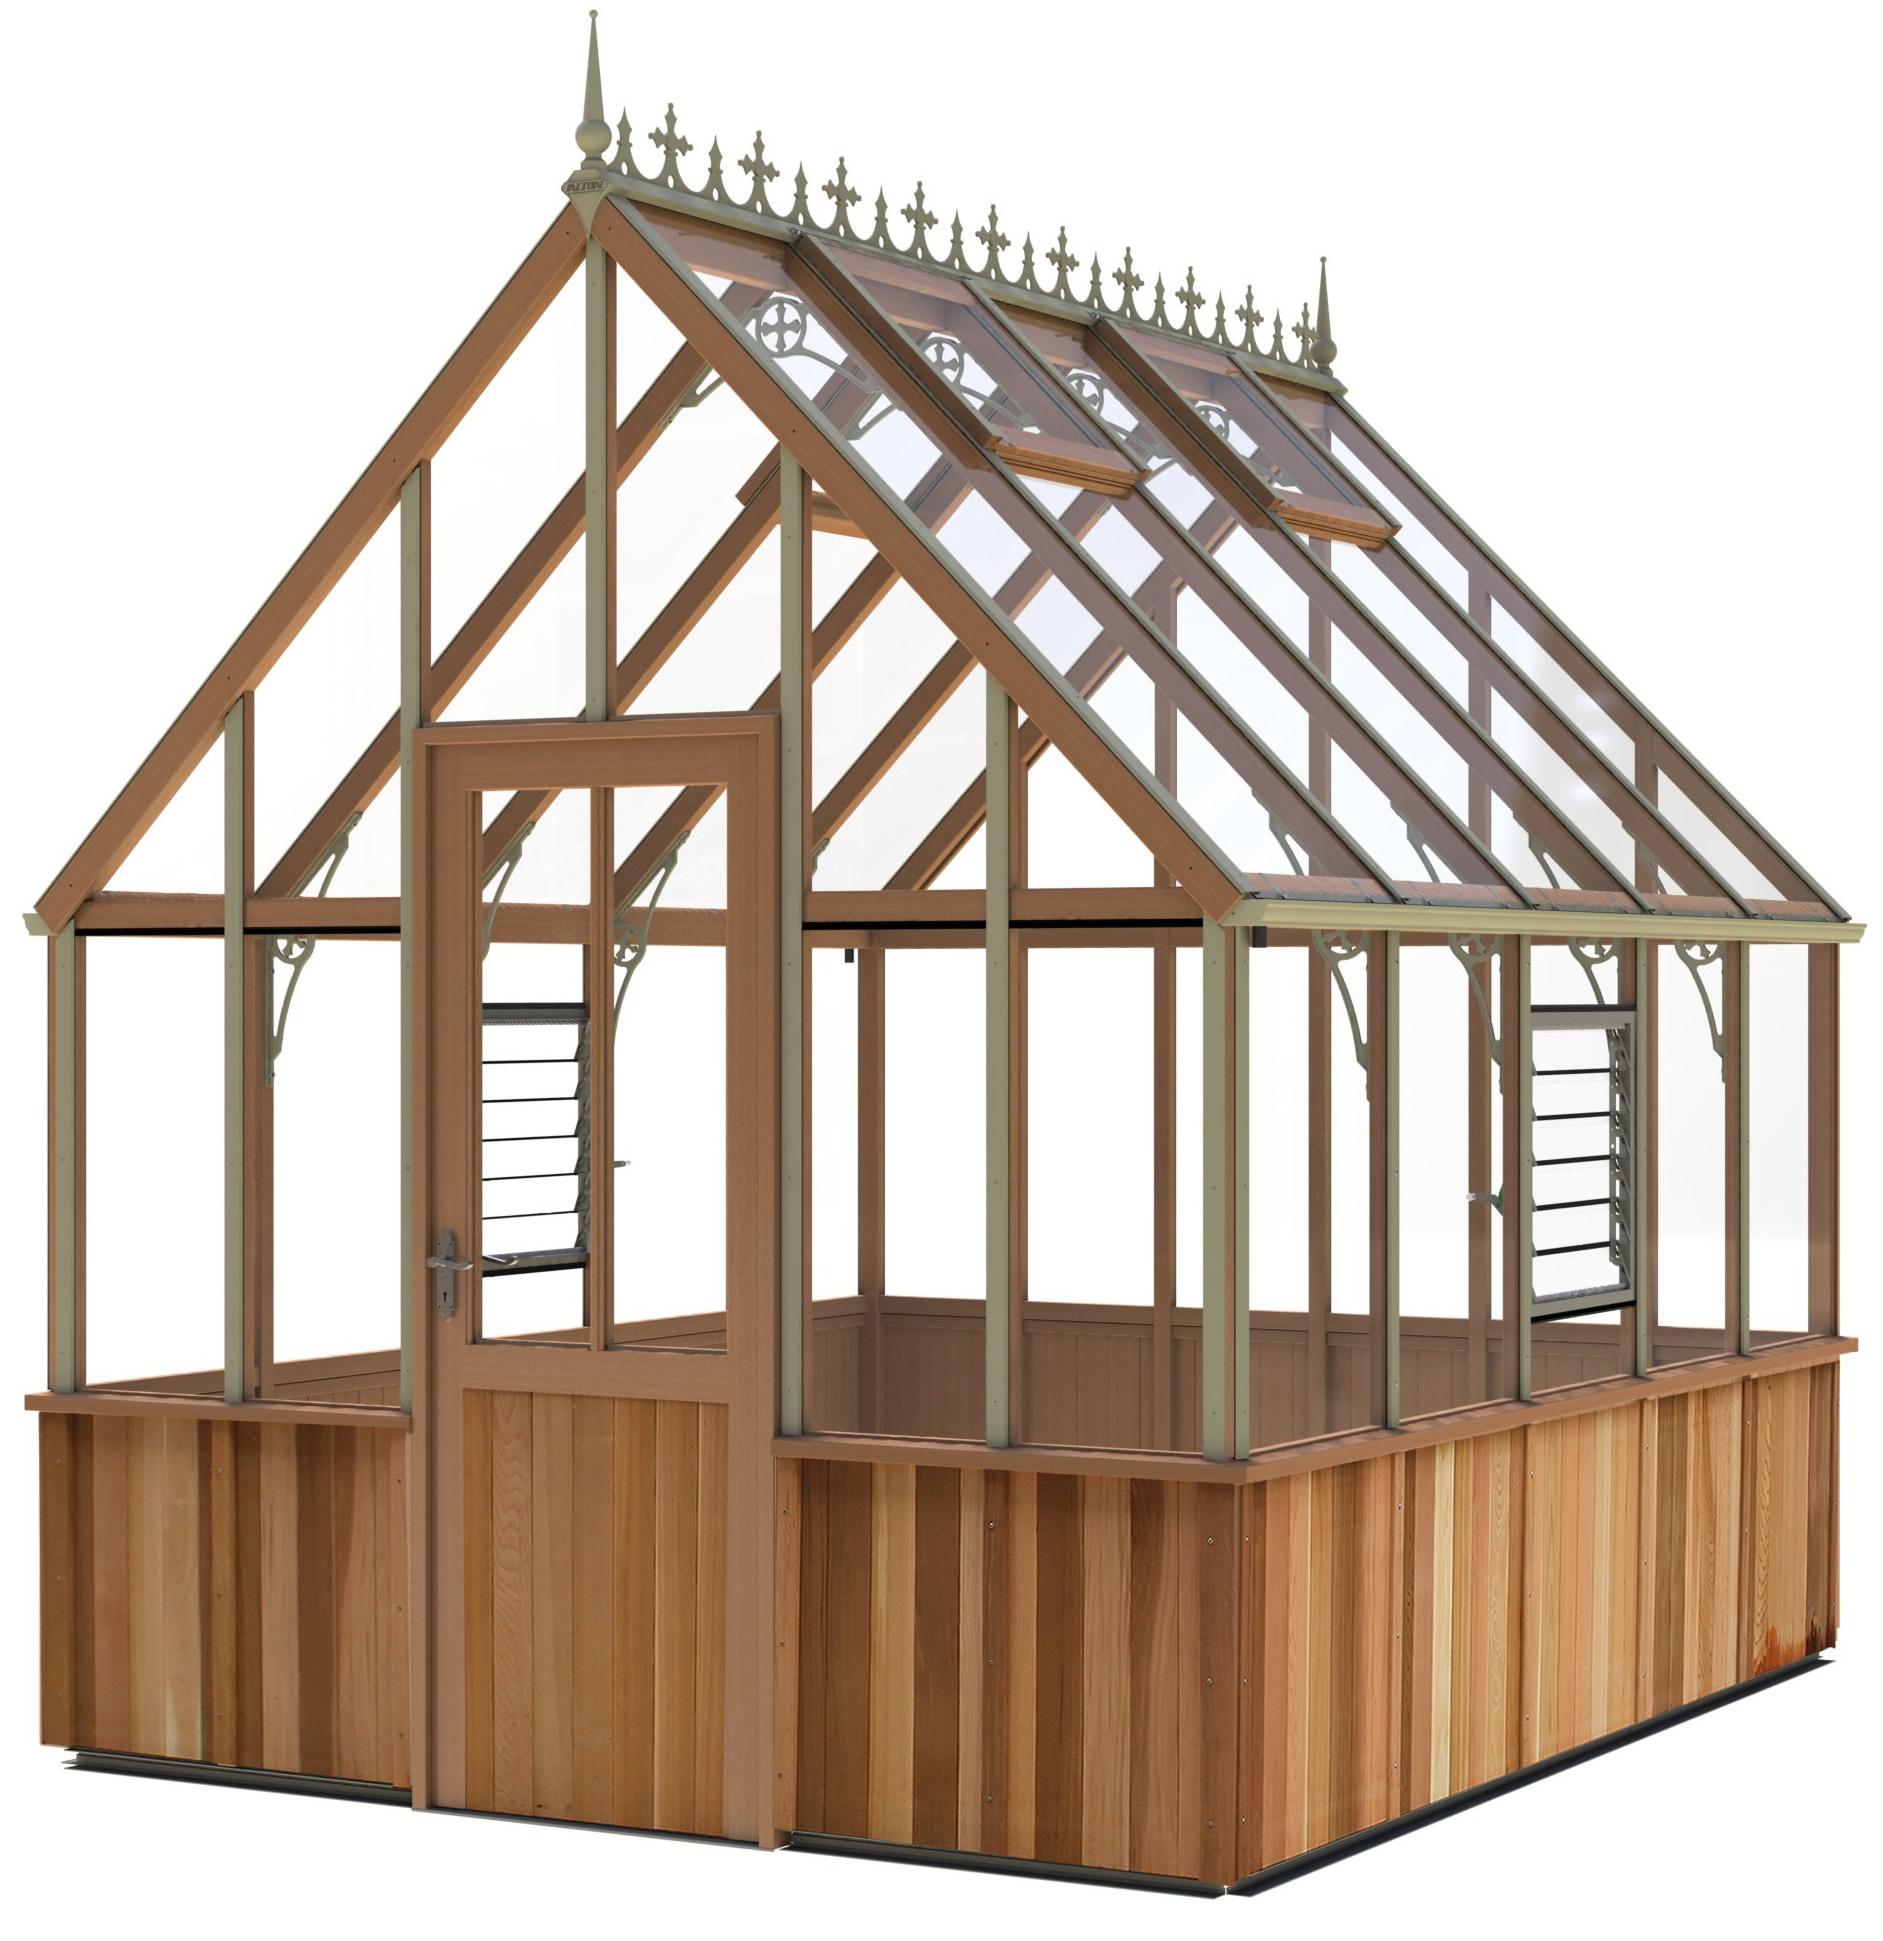 Alton Cheltenham Victorian Cedar Wood Greenhouse 8ft Wide